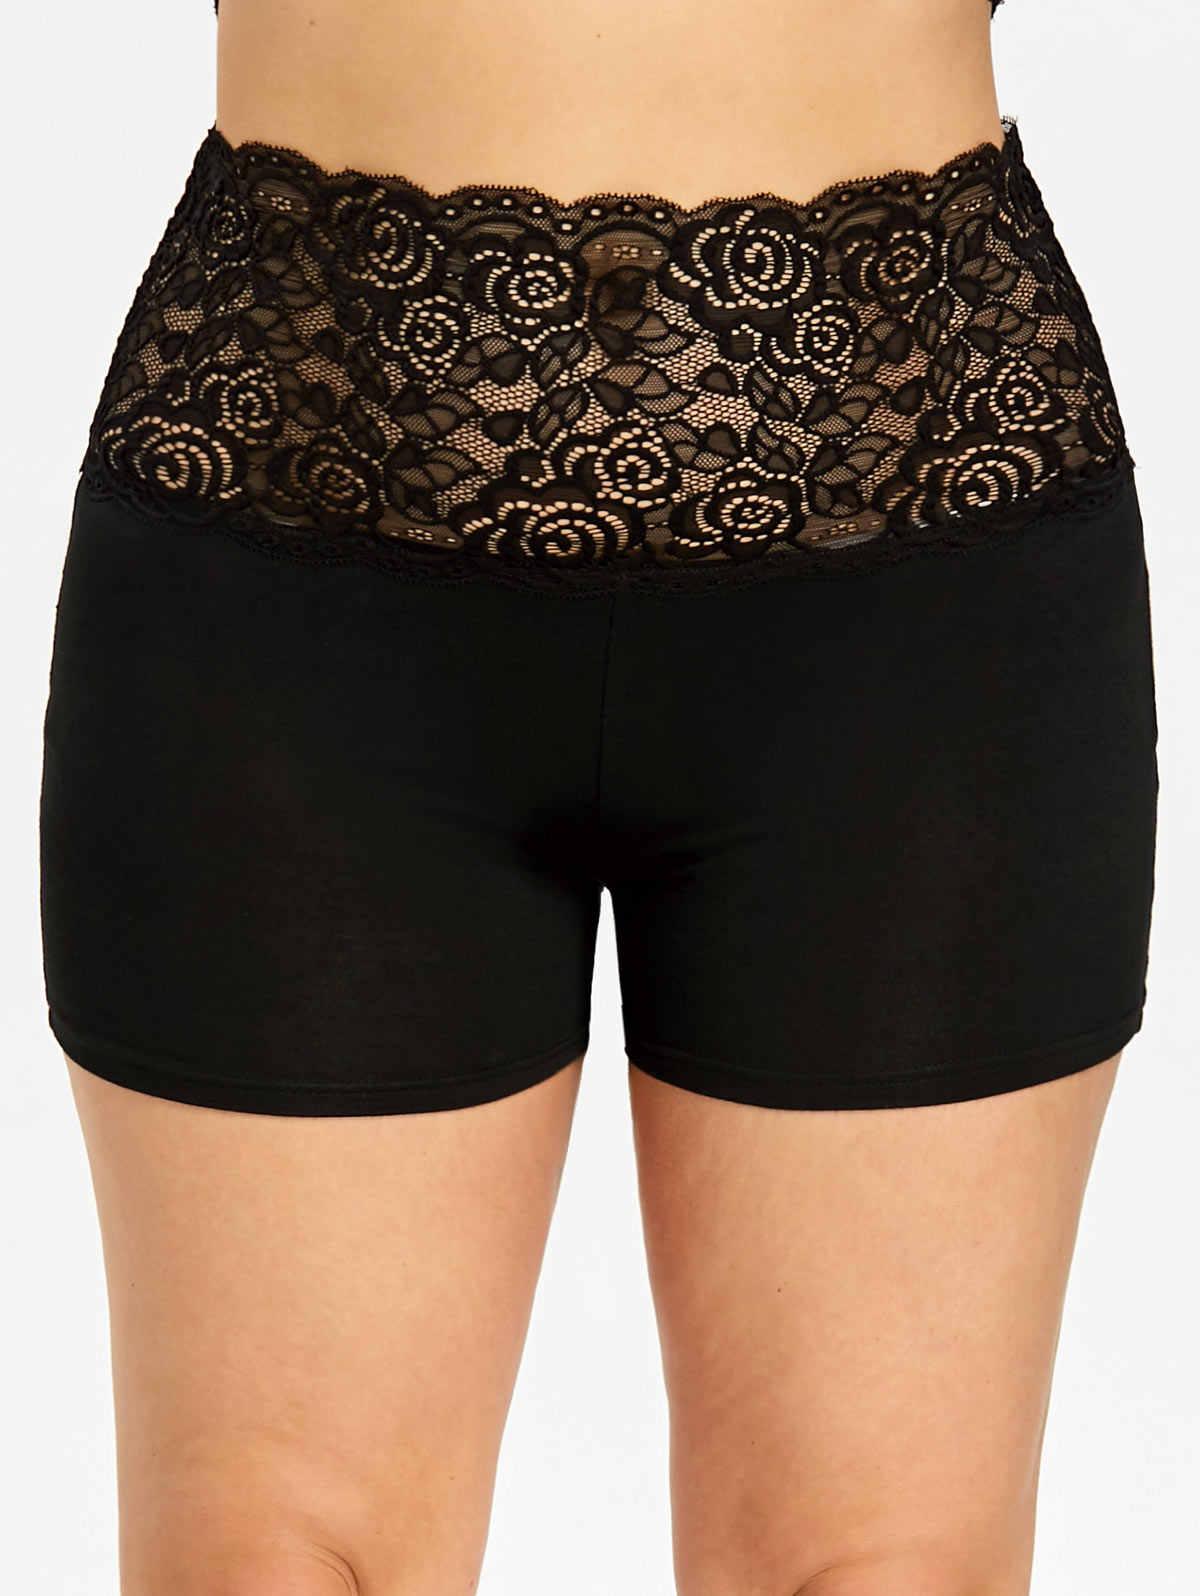 bc143b5309cb9 Gamiss Women Shorts Plus Size 5XL Lace Trim Scalloped Shorts Summer High  Elastic Waist Skinny Pencil